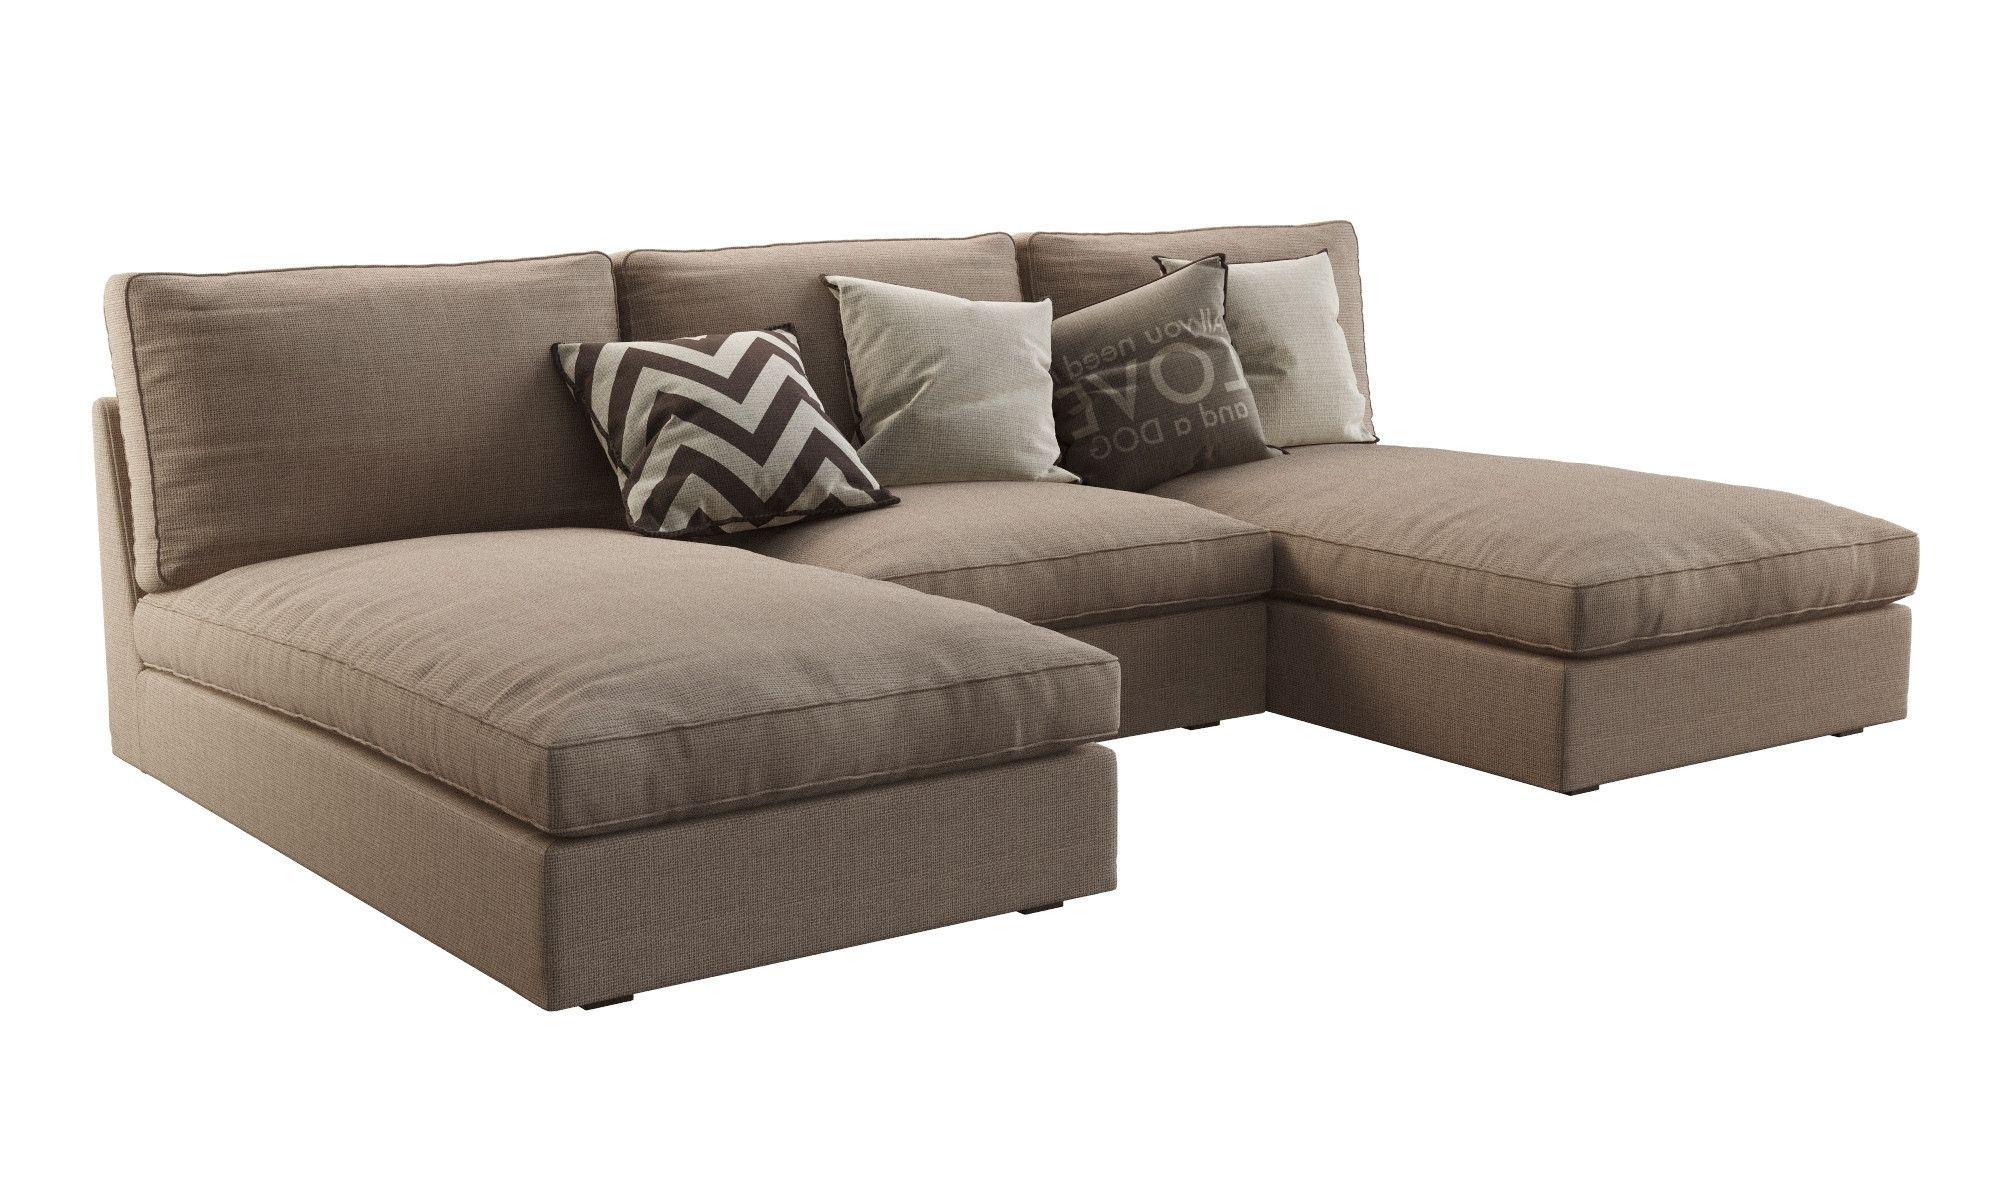 24 Elegante Chaise Lounge Sofa Ikea Sofa, Grau